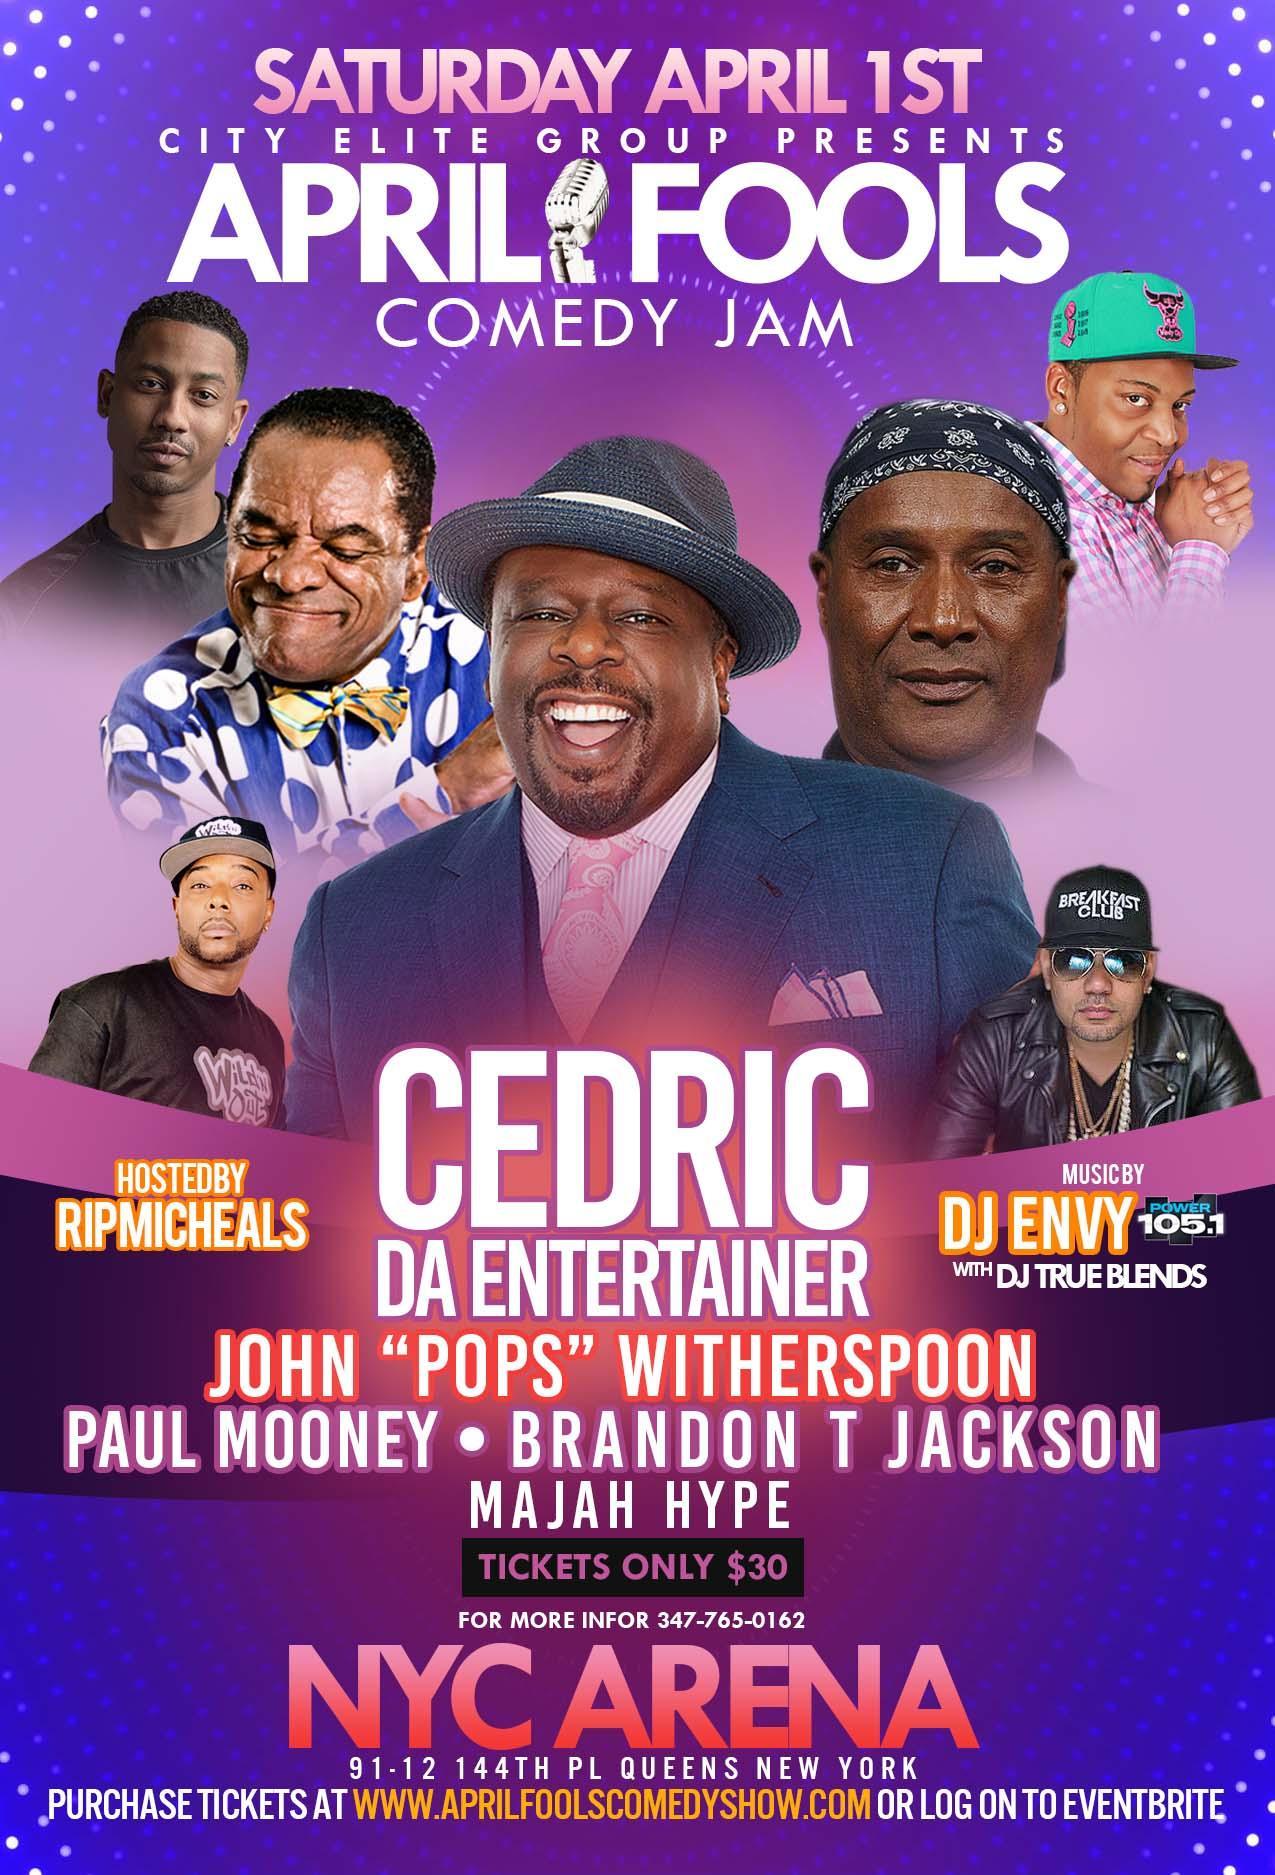 April Fools Comedy Jam 2017 | Comedy News